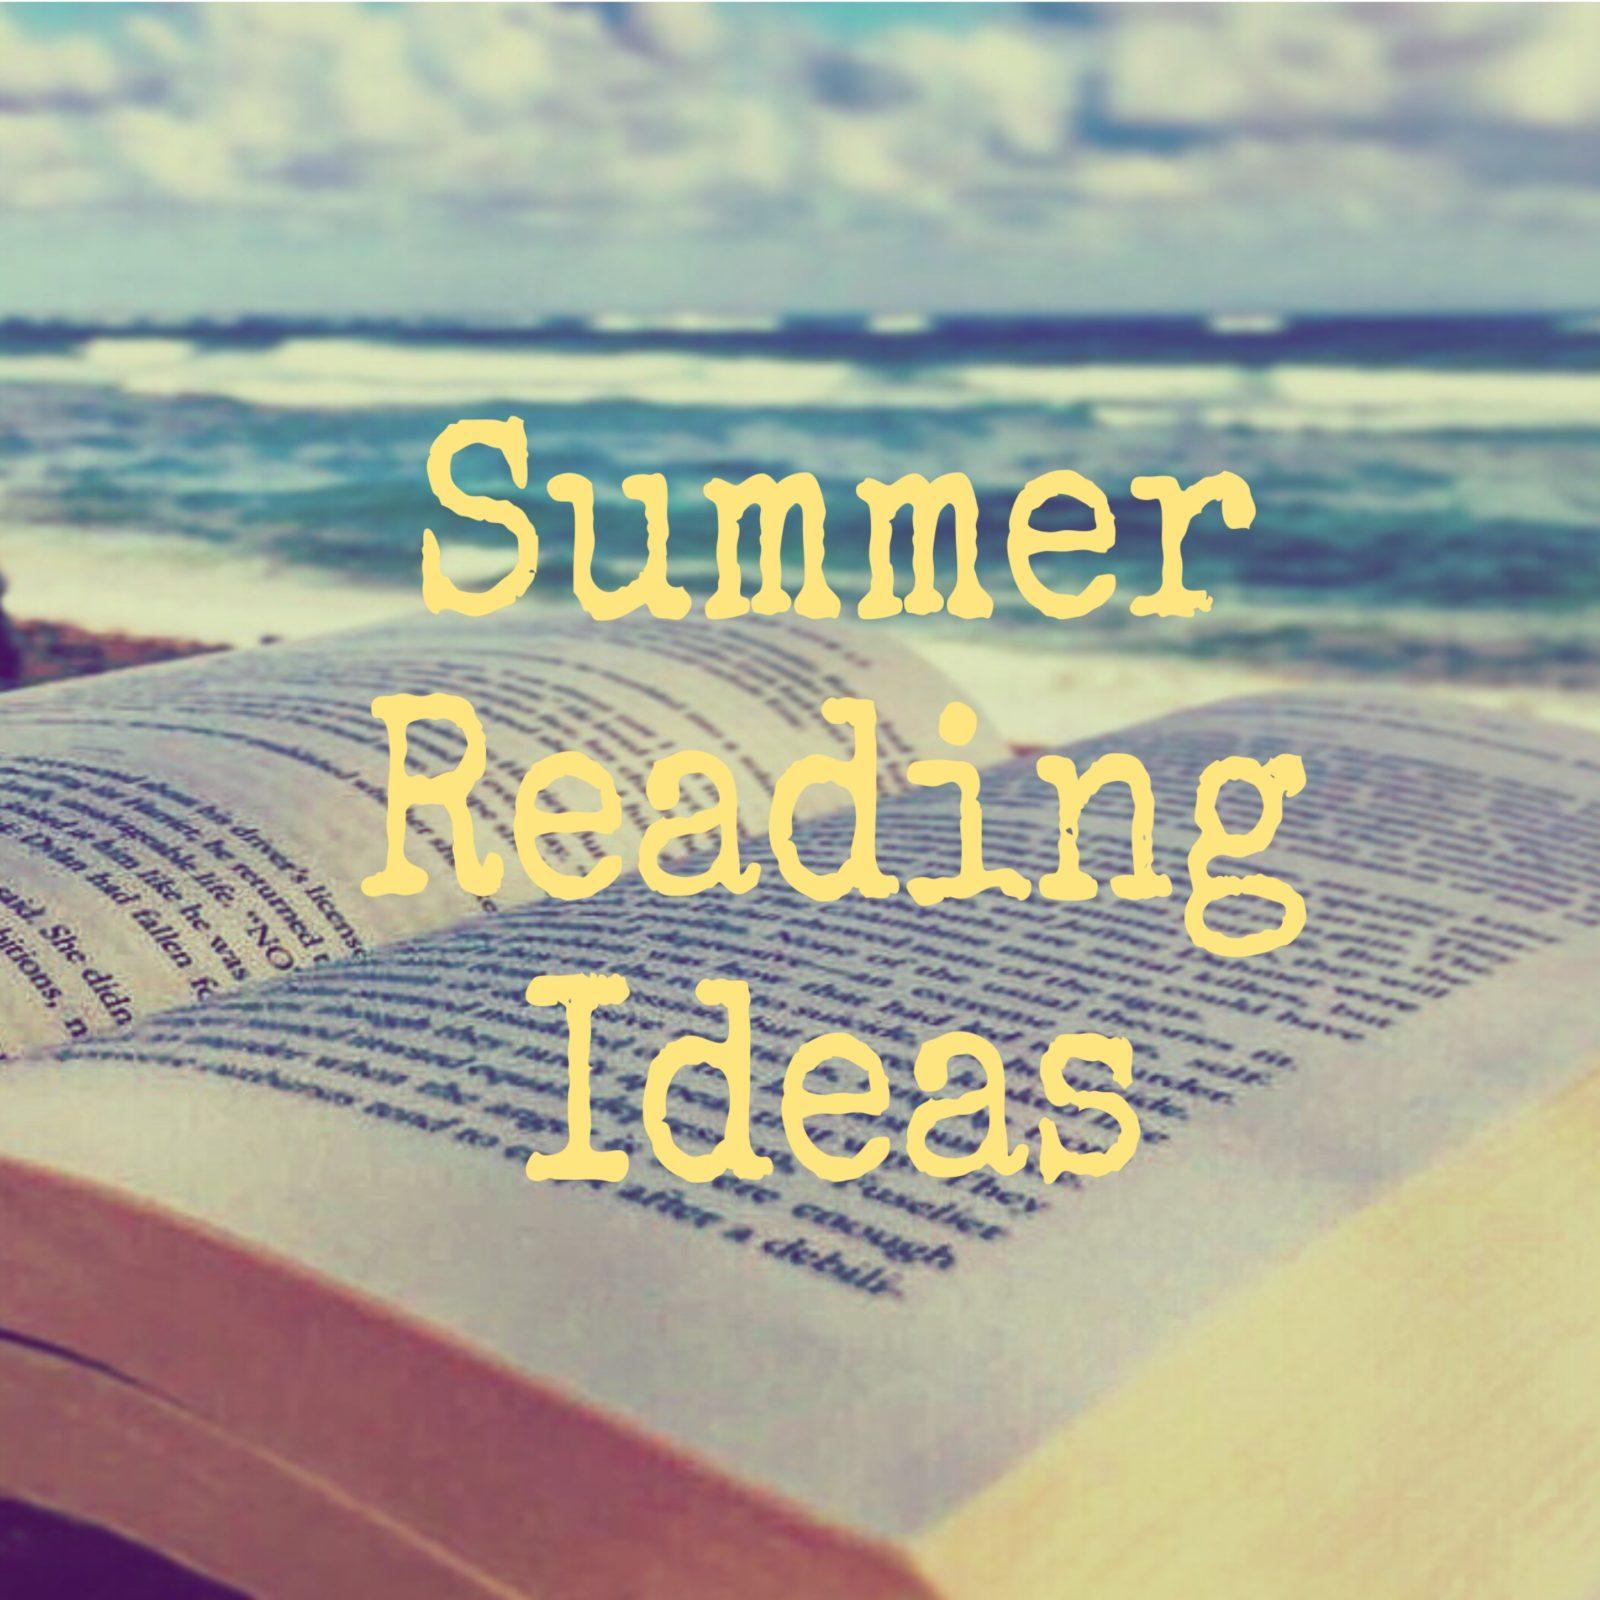 Summer book reading